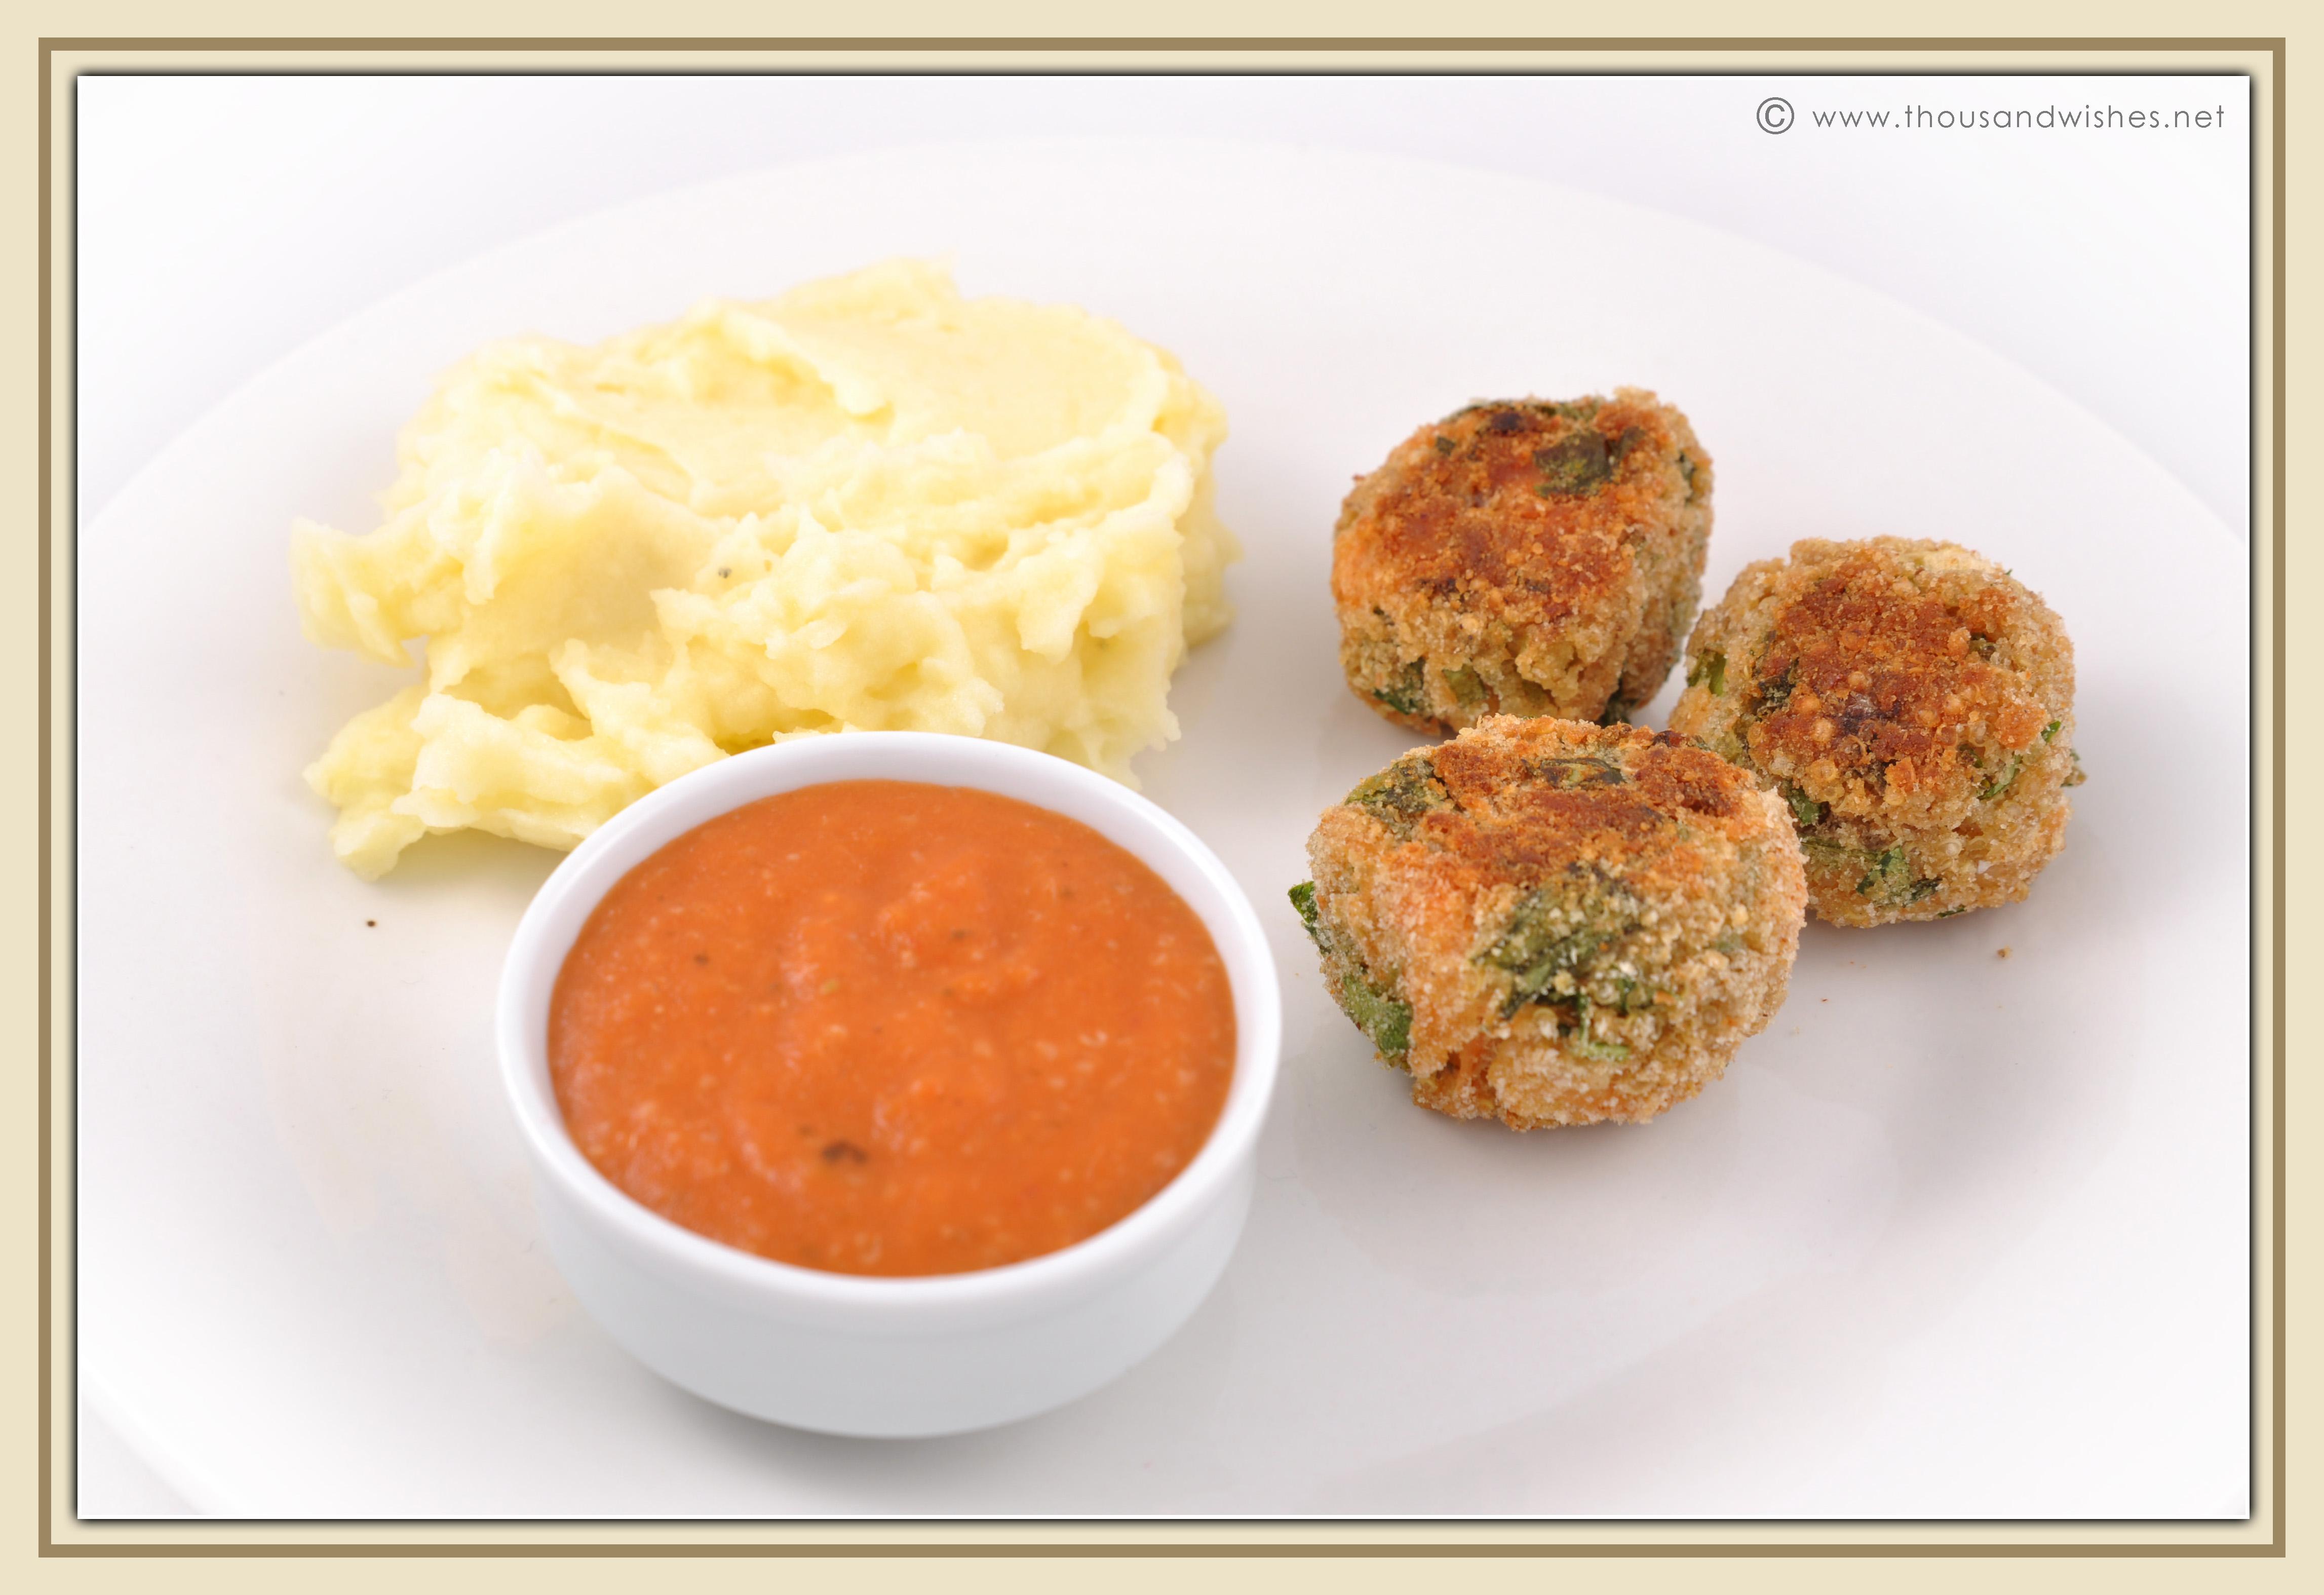 05_salmon_quinoa_parsley_meatballs